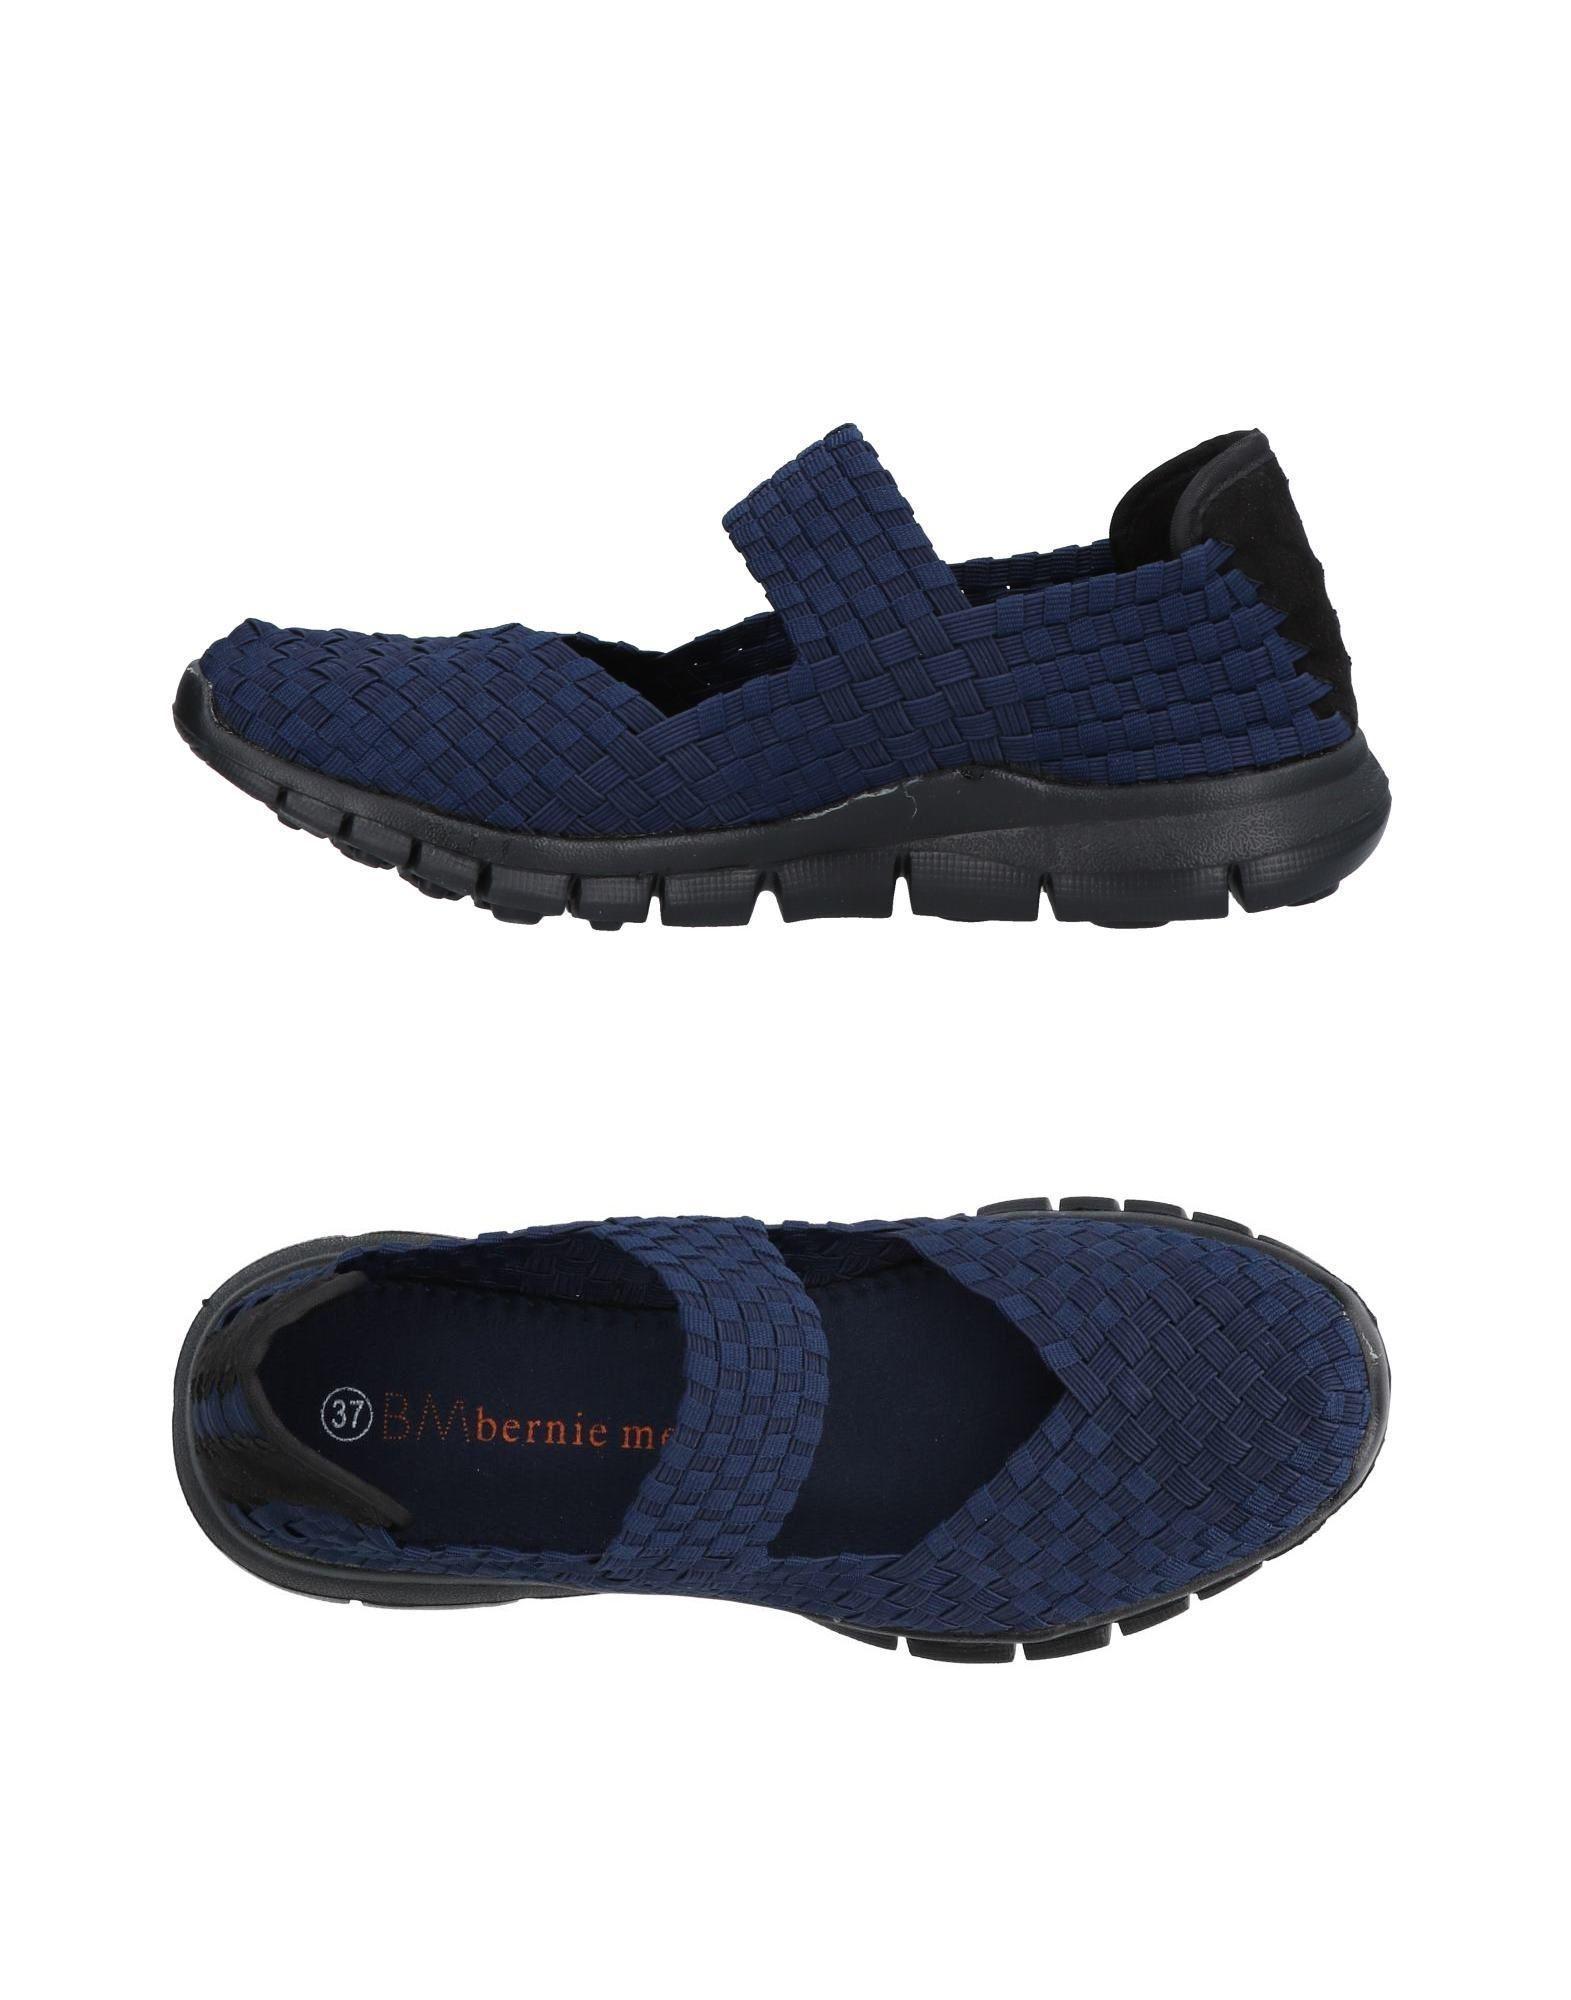 FOOTWEAR - Low-tops & sneakers bernie mev. Shop Offer For Sale Visit New Cheap Price jcftfz1